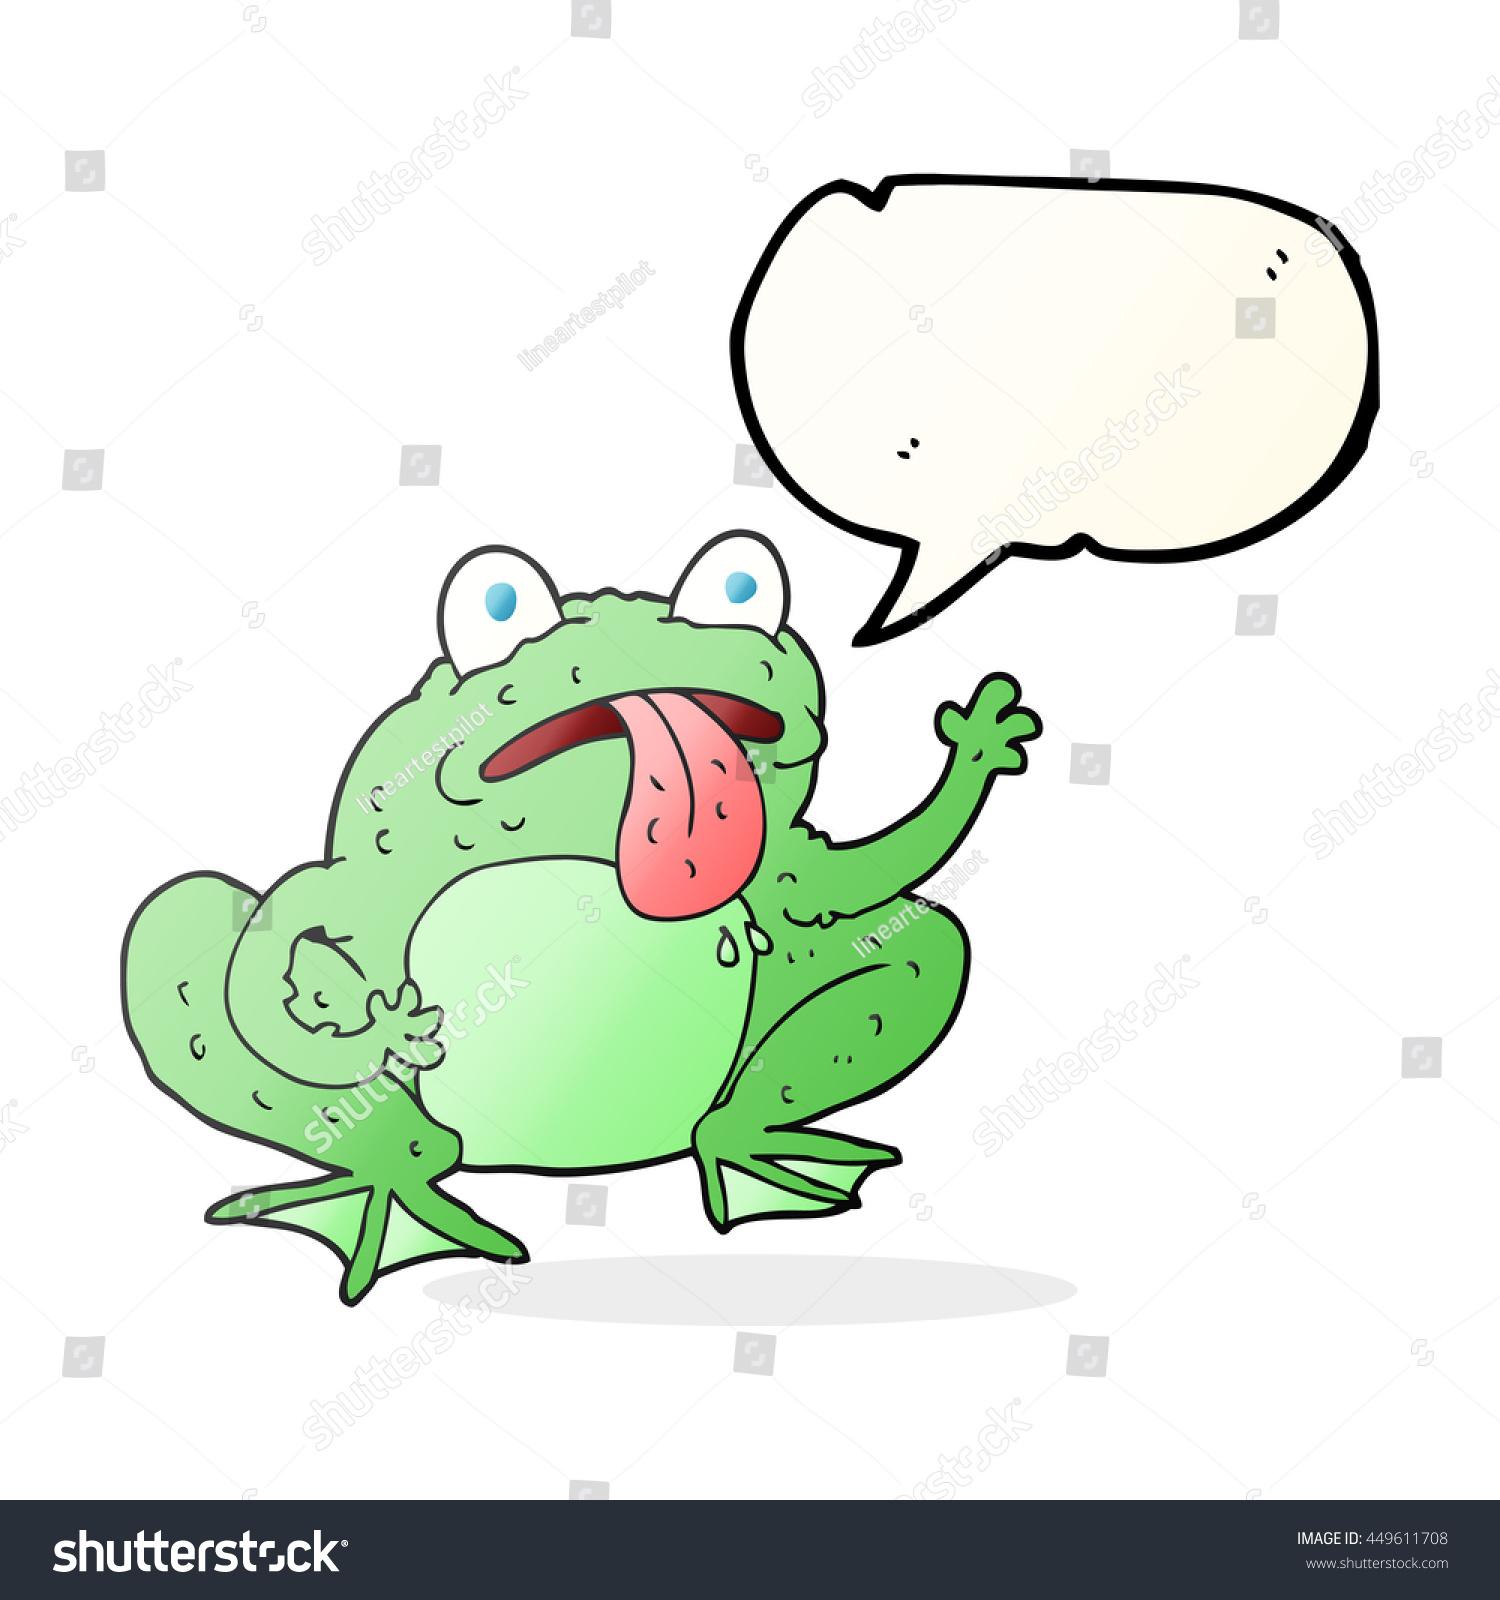 hight resolution of freehand drawn speech bubble cartoon frog